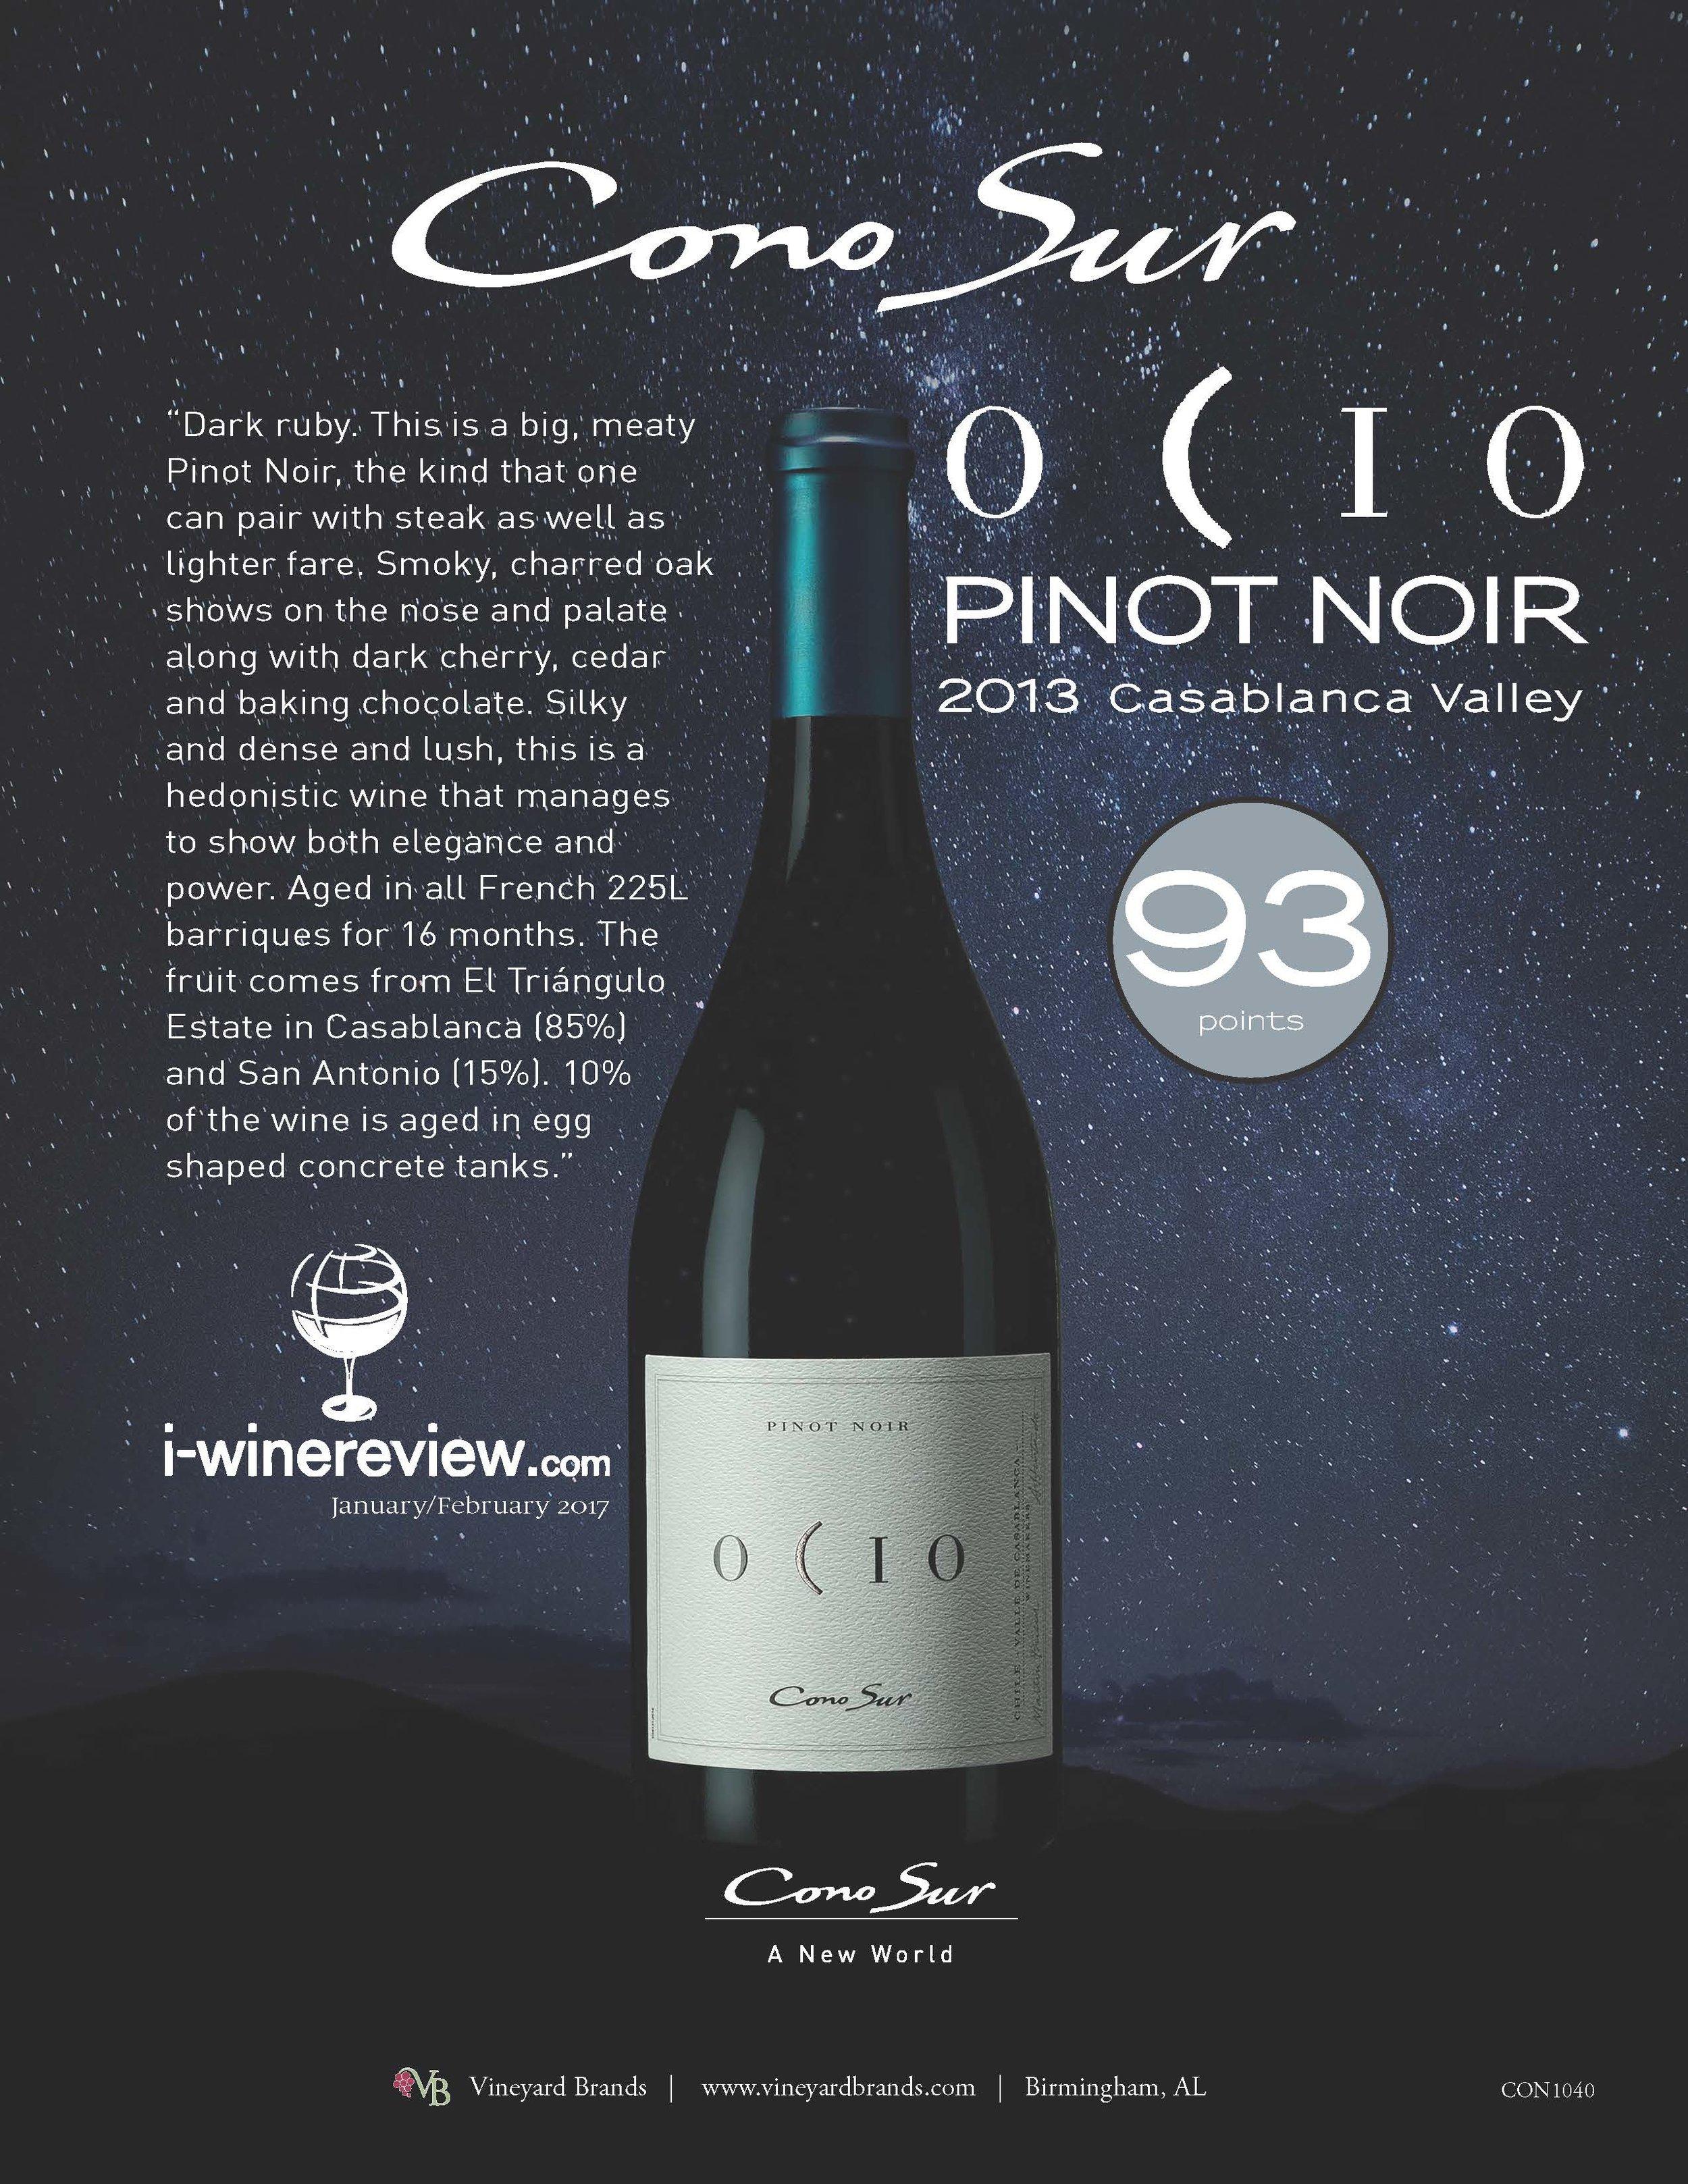 Cono Sur Ocio Pinot Noir 2013.jpg